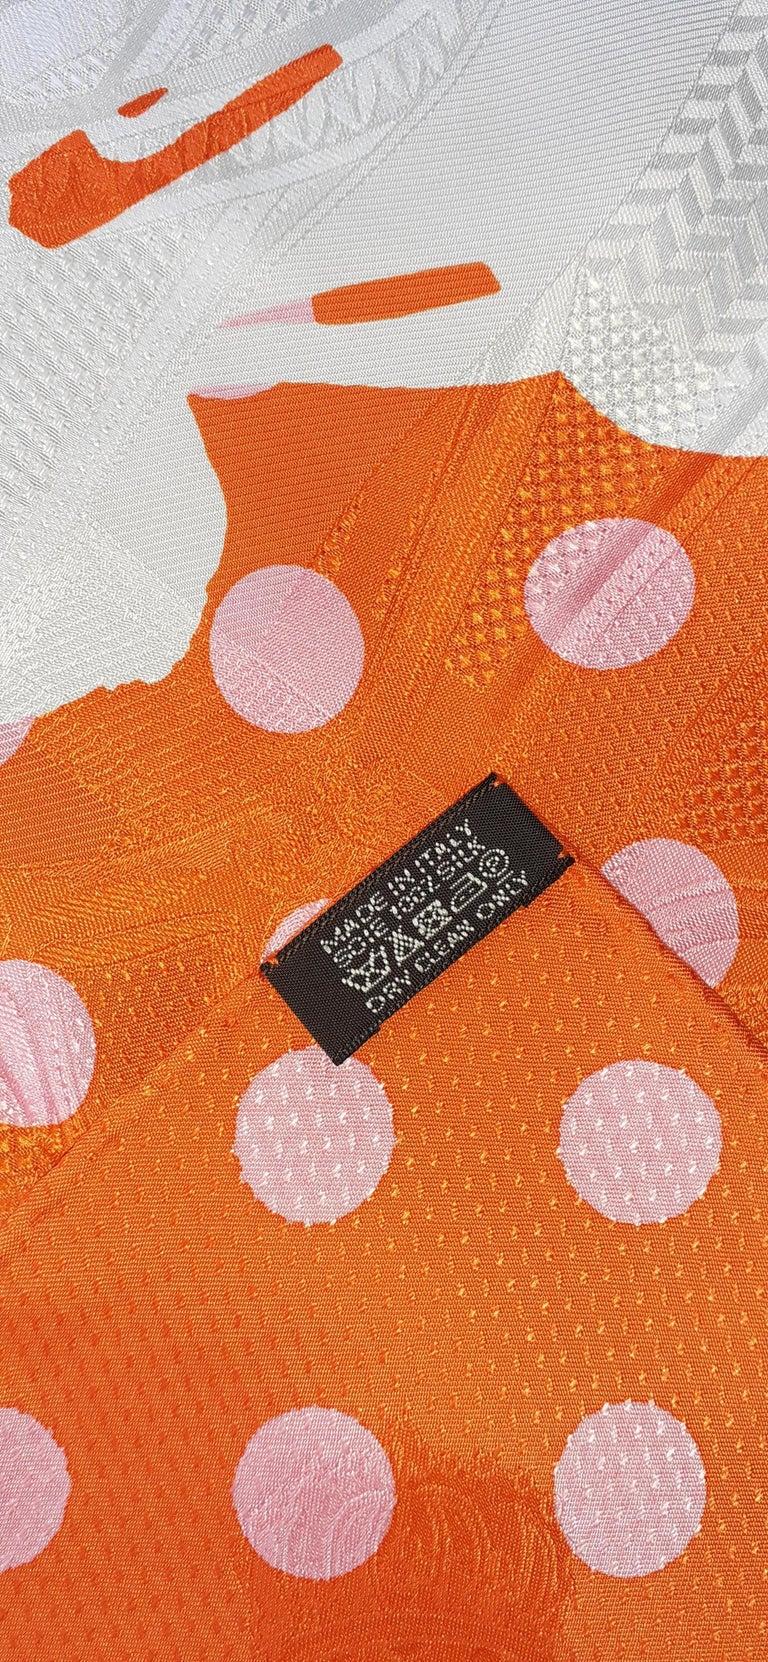 Hermès Silk Scarf Cavalcadour Brides de Gala A Pois Origny Orange Pink 90 cm For Sale 3